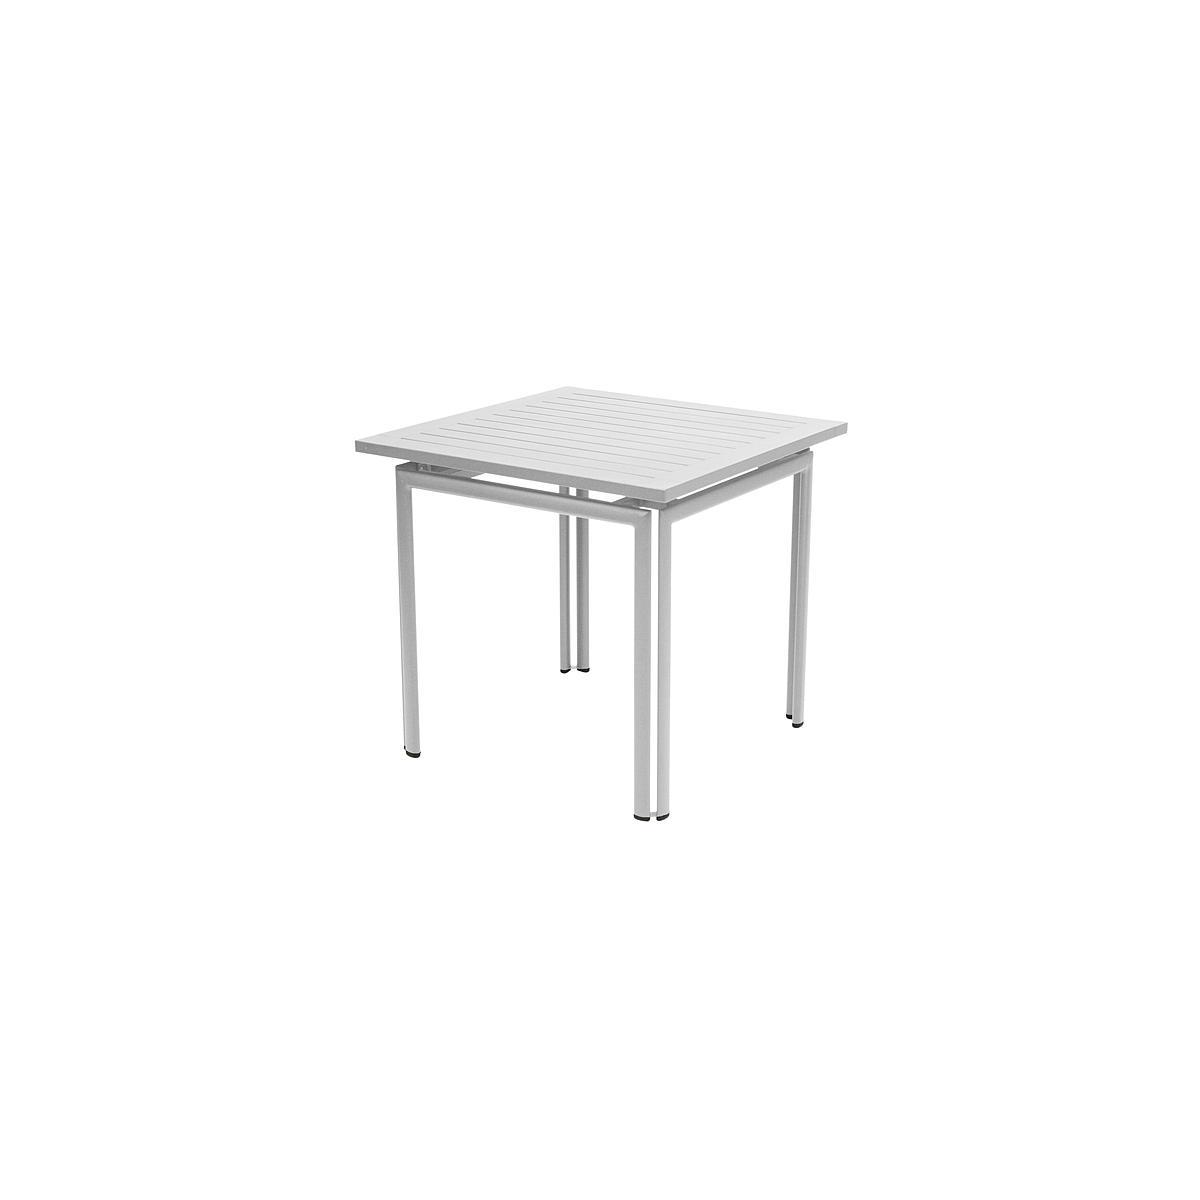 COSTA by Fermob Table 80x80 cm gris métal